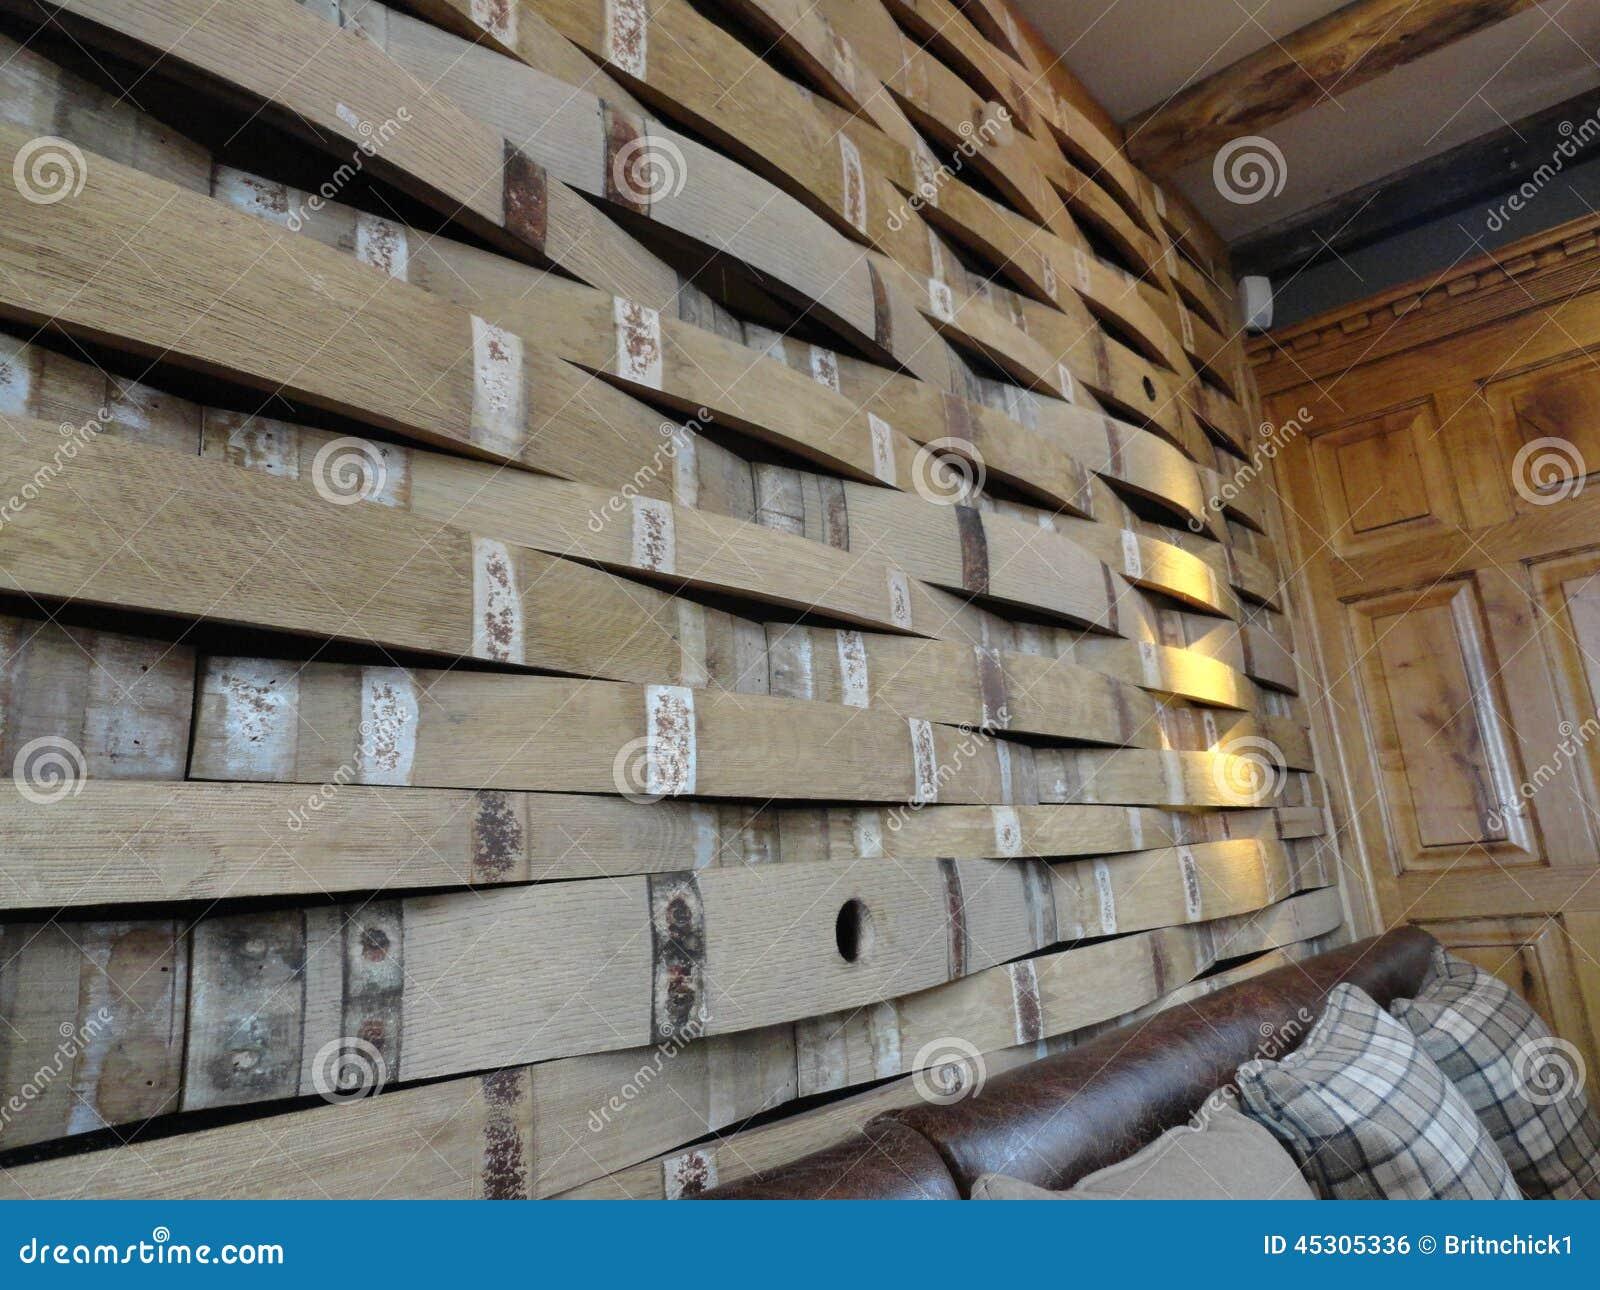 Repurposed Beer Barrels Make A Unique Wall Stock Photo